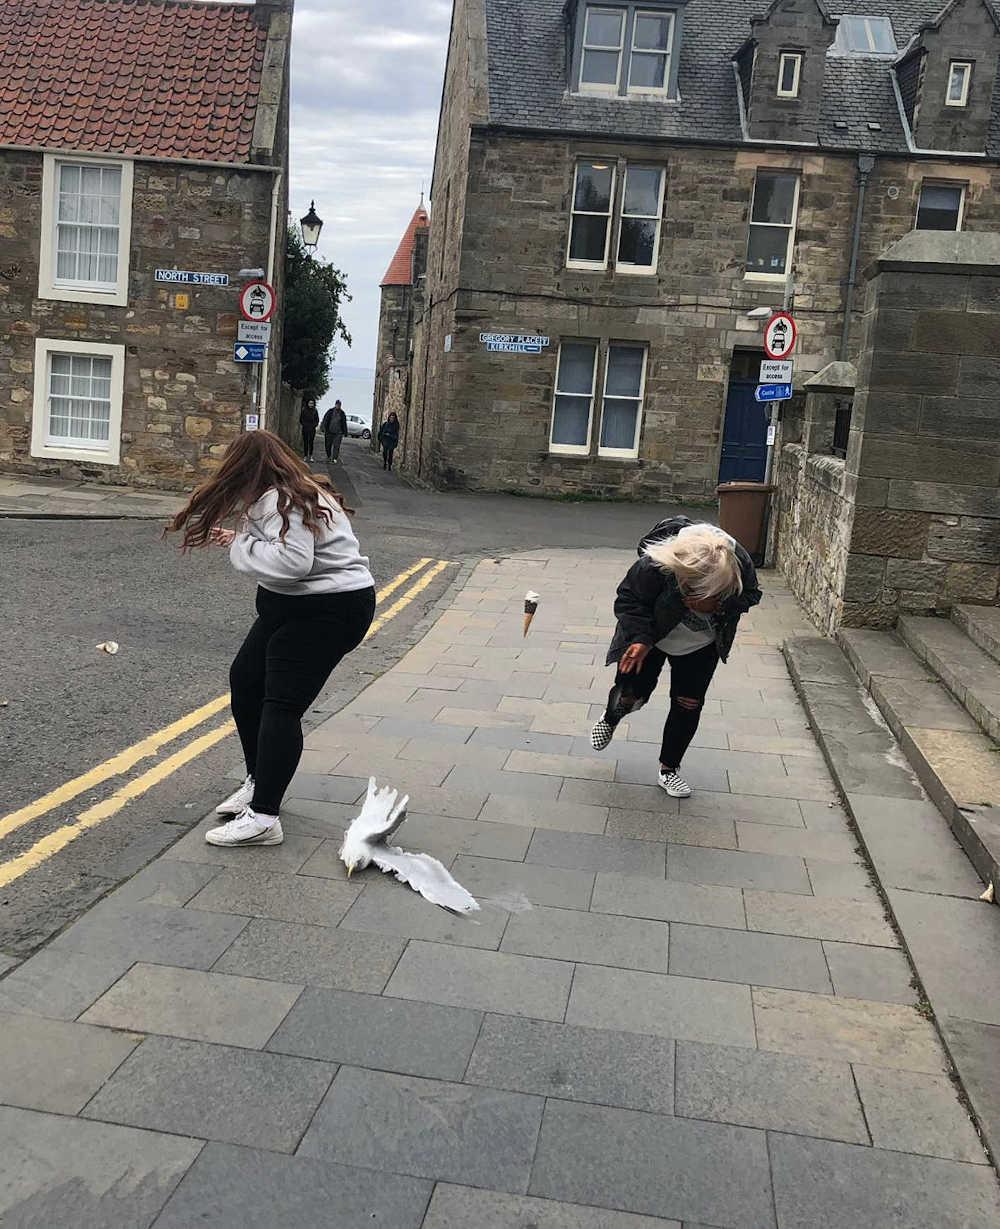 Seagull divebomb